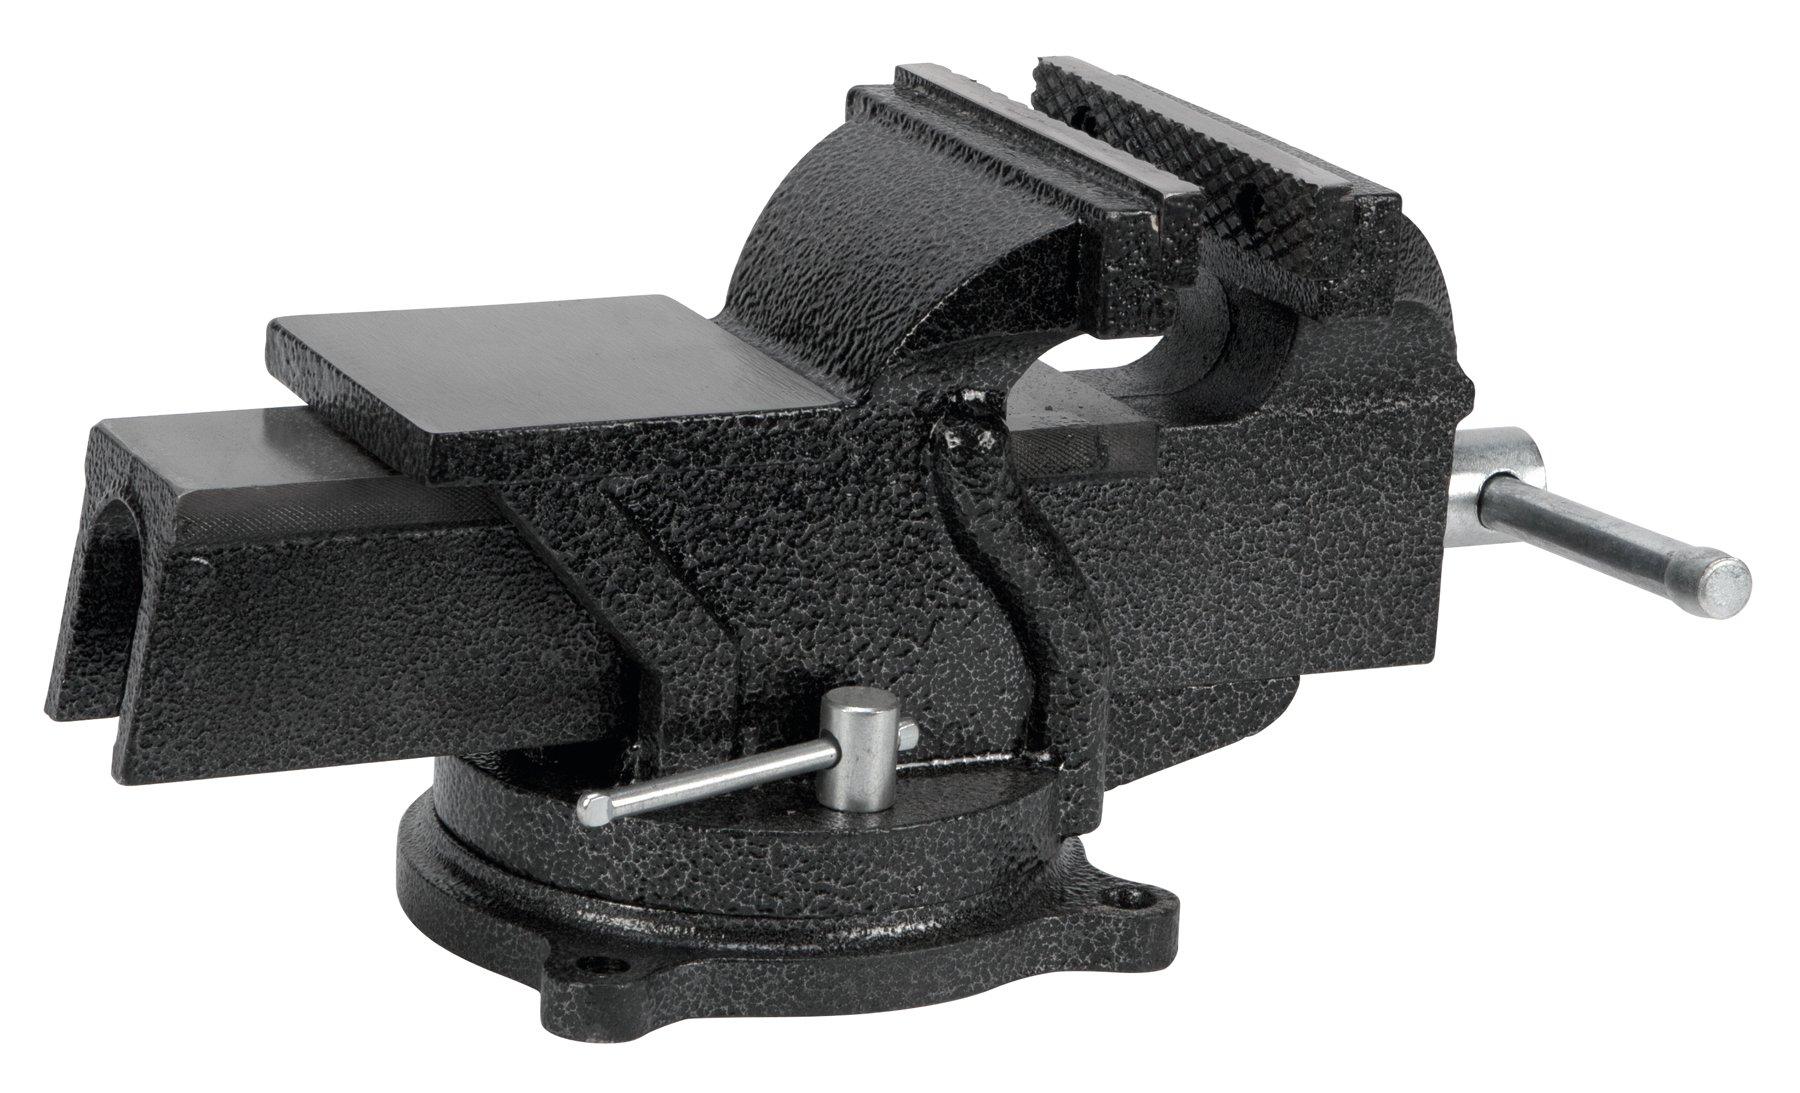 Performance Tool MV5 Hammer Tough 5-Inch Machinist Vise